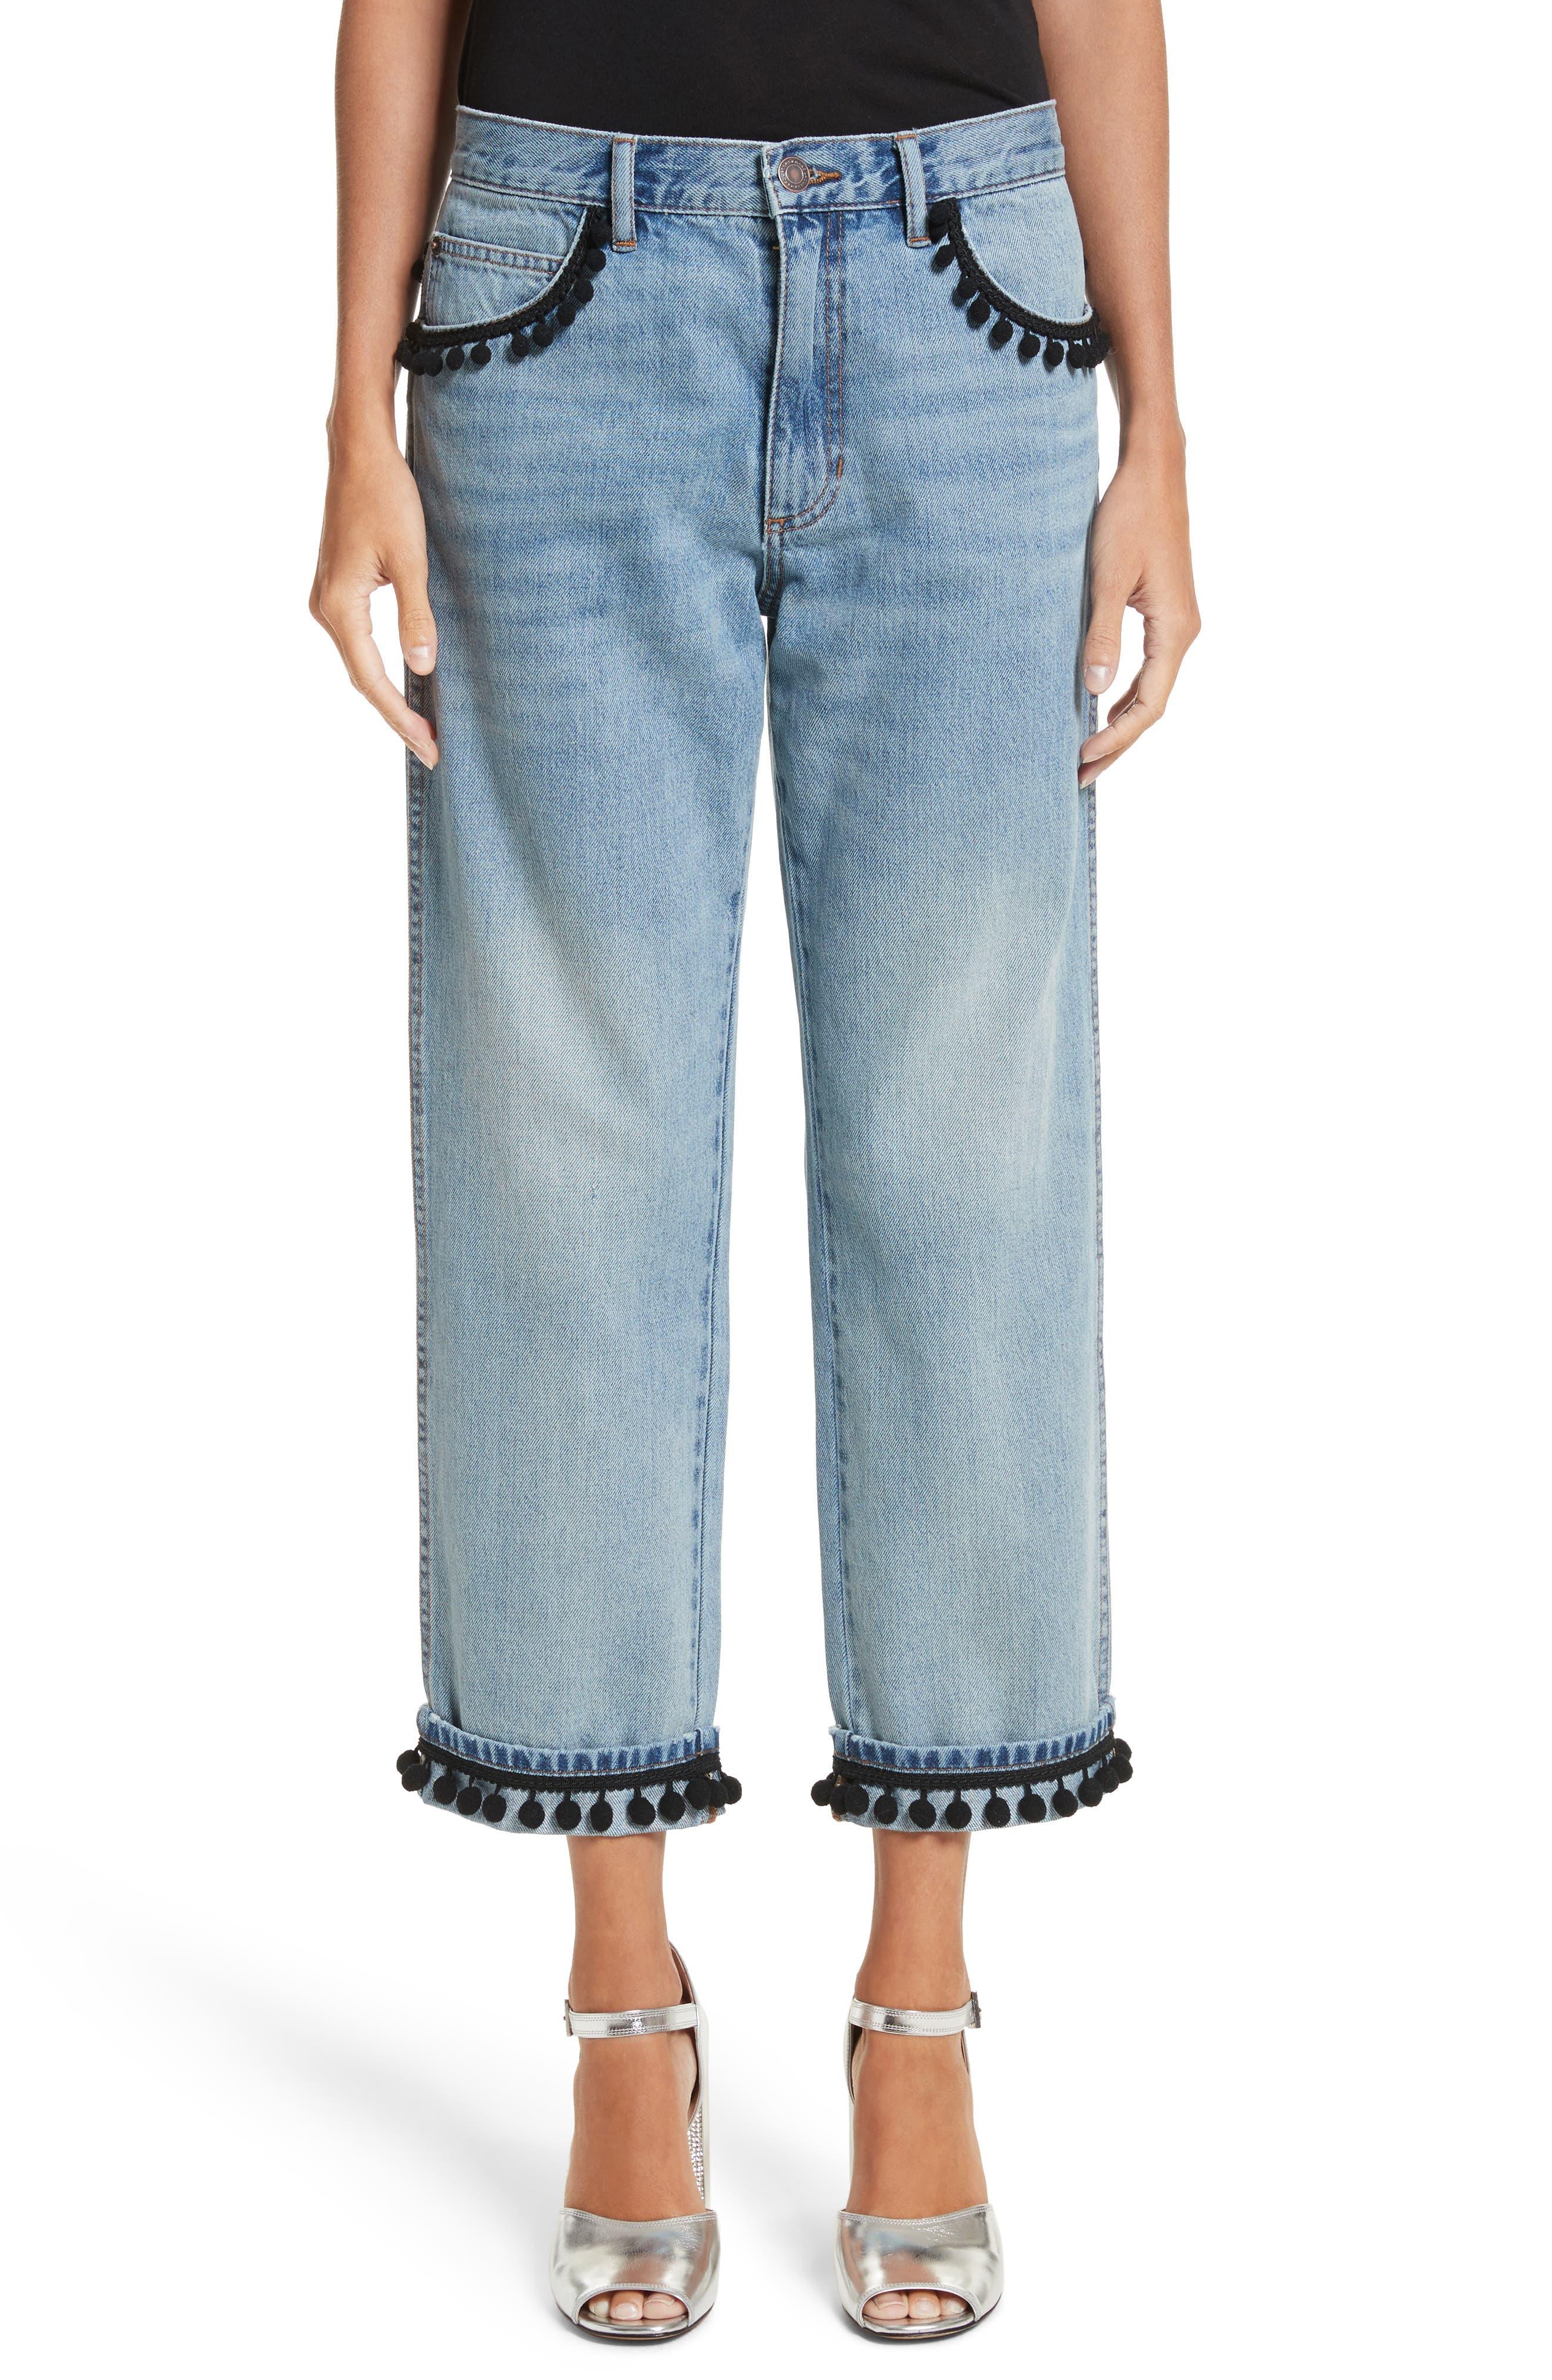 Alternate Image 1 Selected - MARC JACOBS Pom Trim Crop Jeans